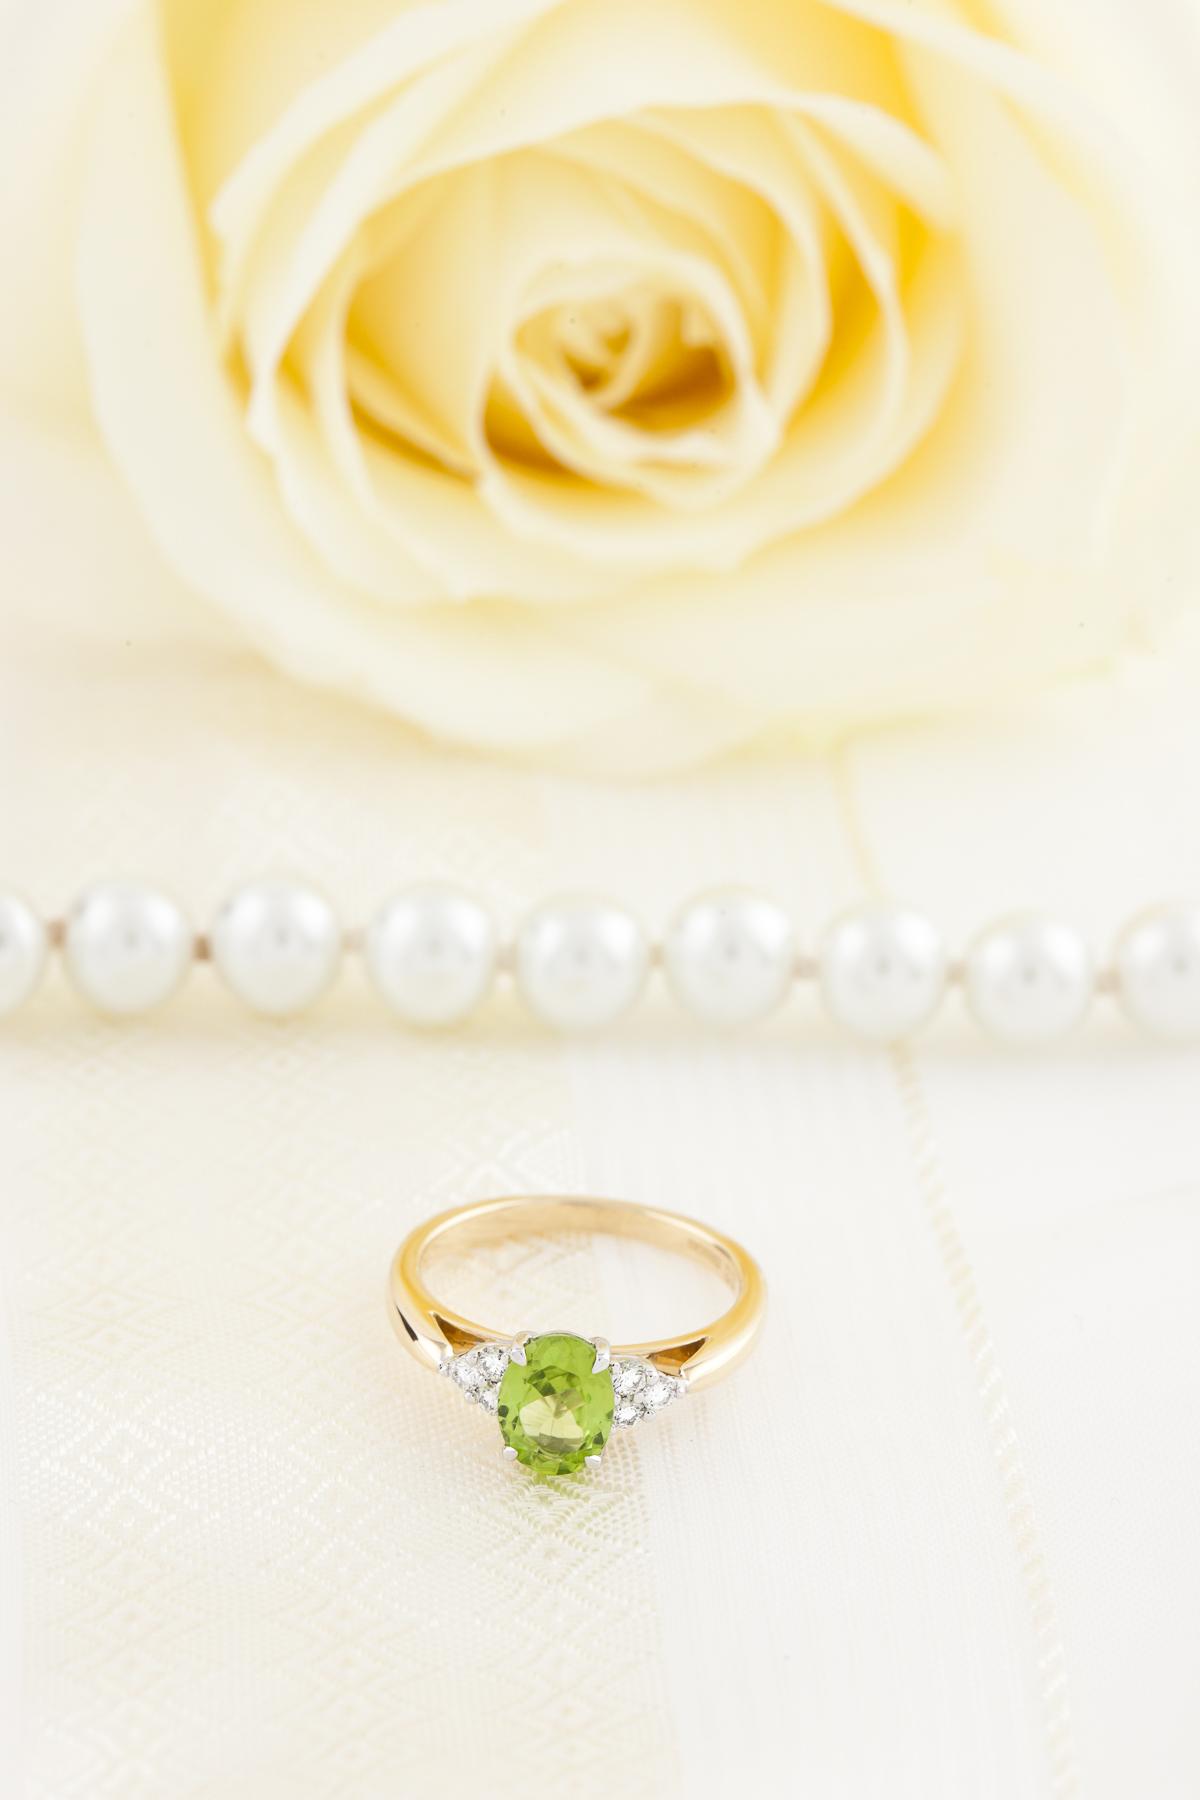 Inel Peridot si Diamant Dama Aur Alb 18kt cu Peridot Oval si 3 Diamante Rotund Briliant pe Fiecare Parte-img1